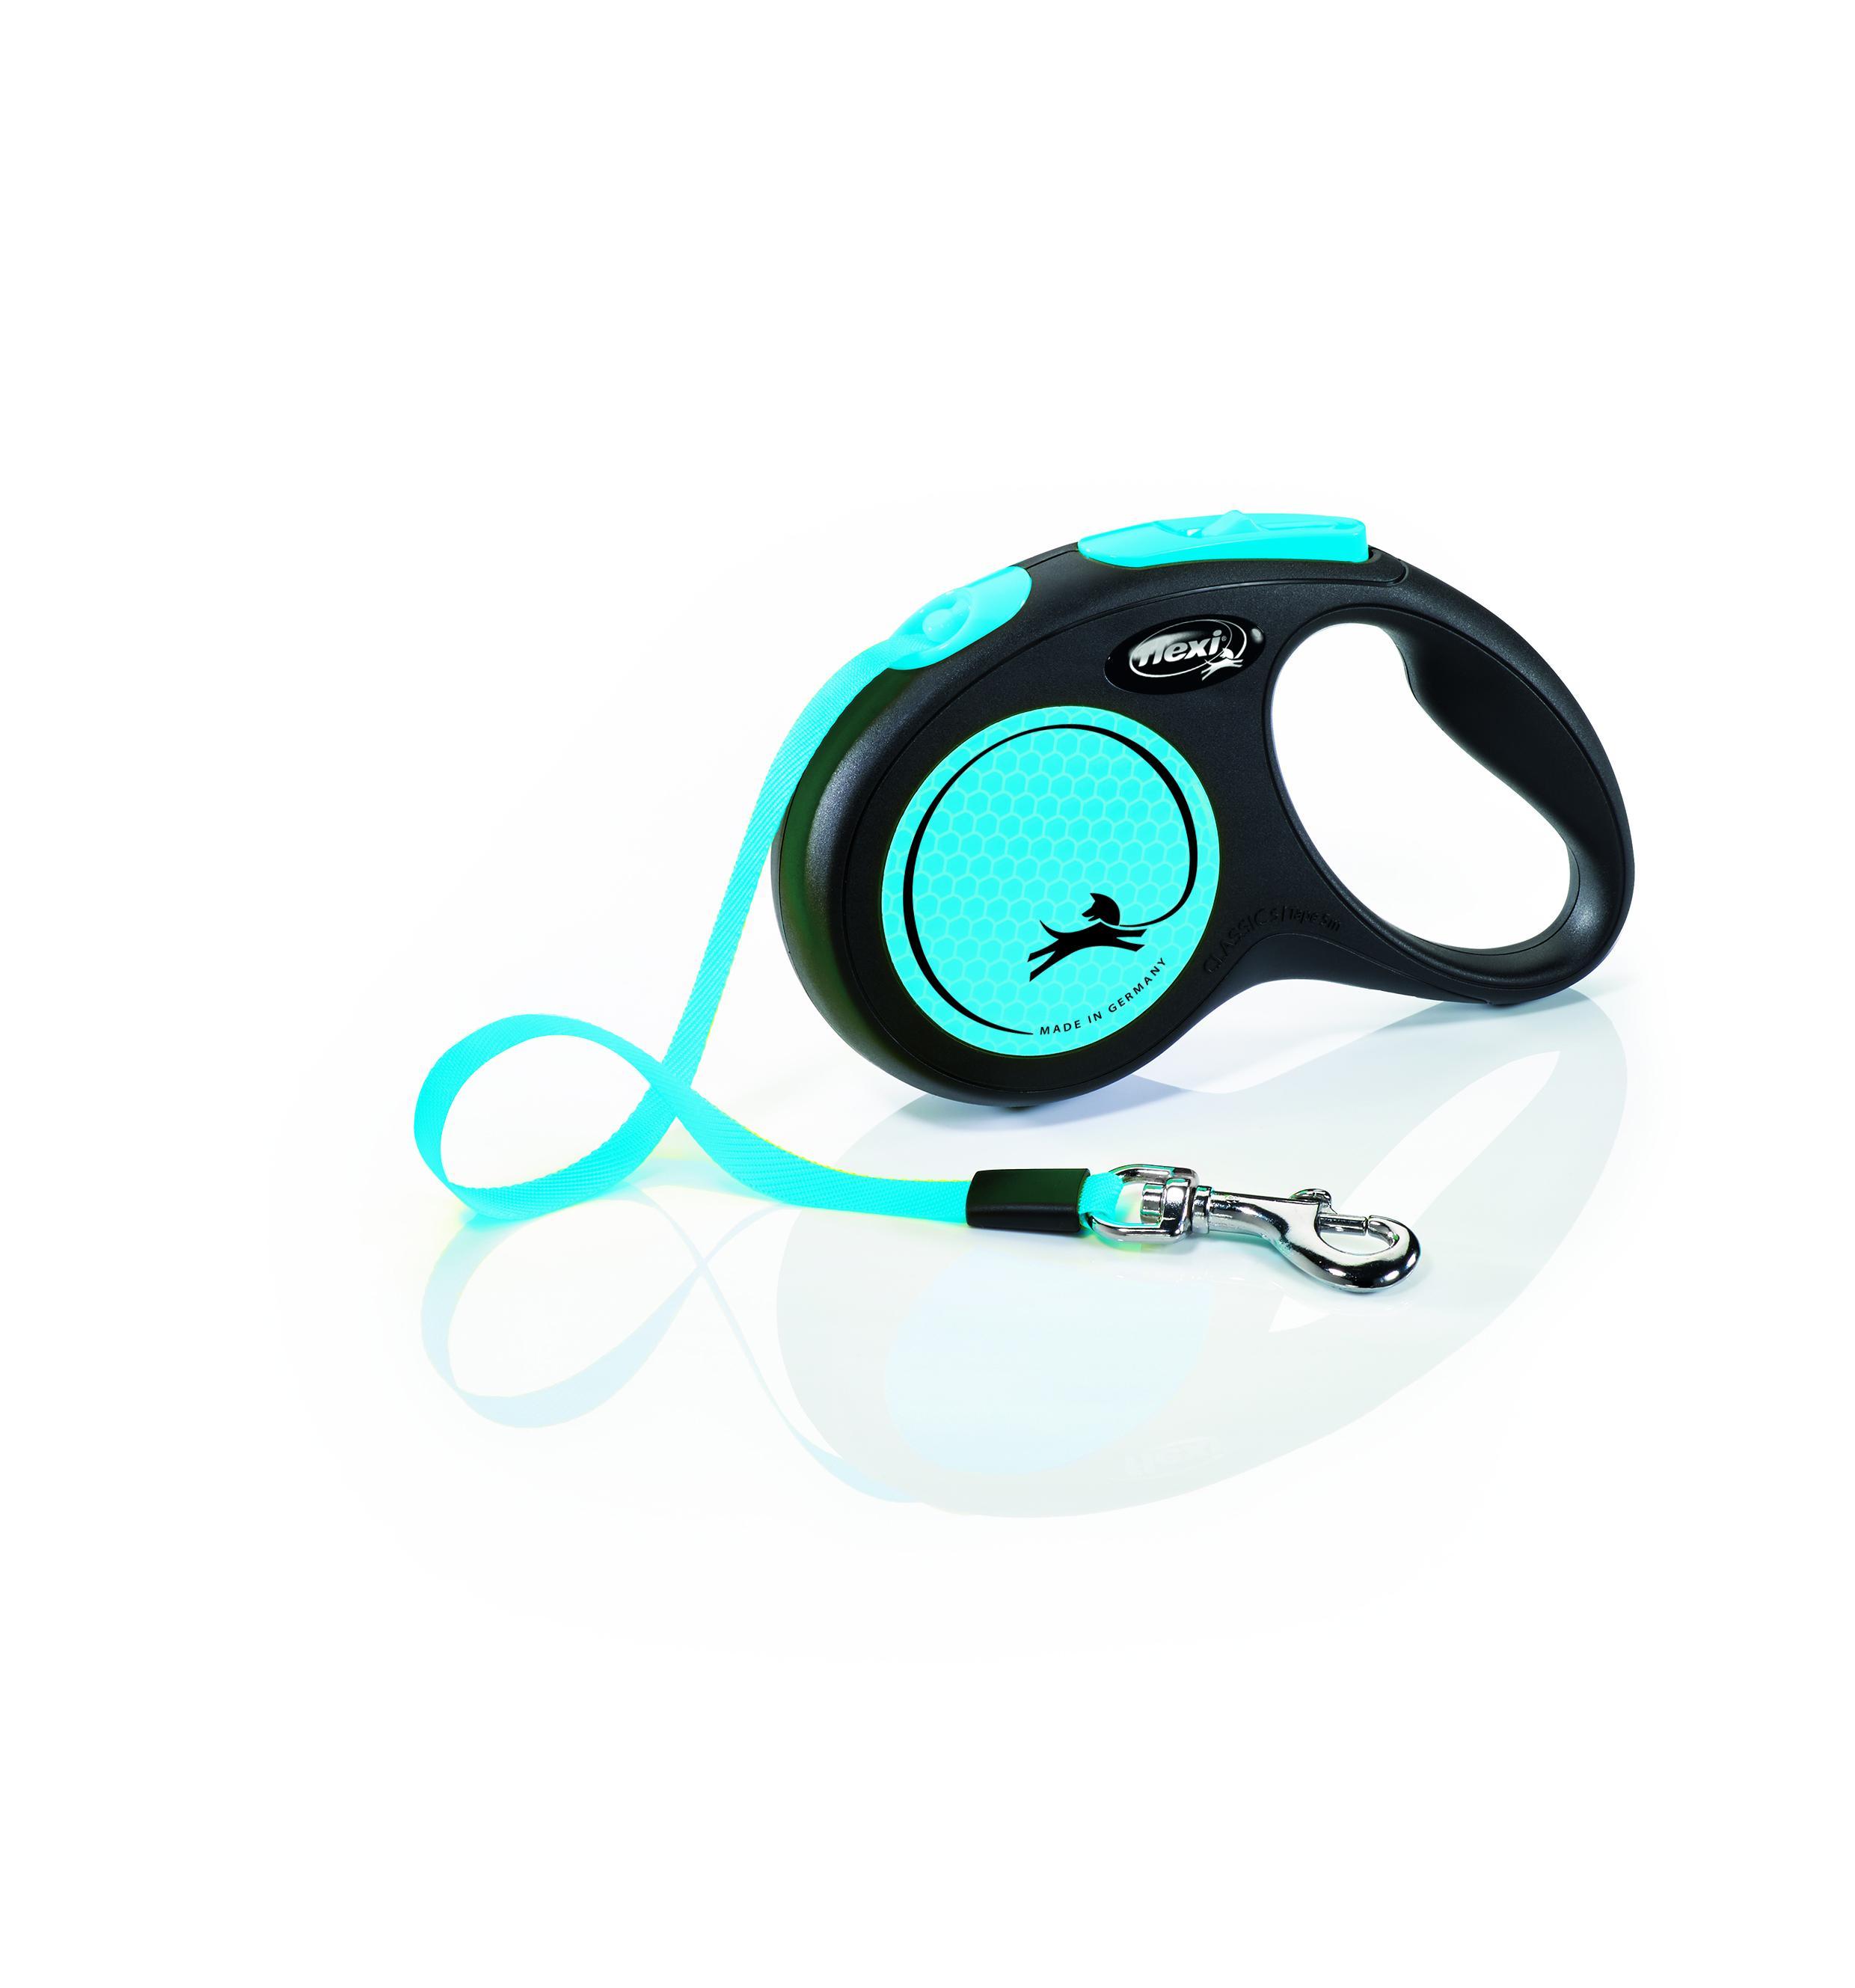 Flexi New Neon Tape Dog Leash, Black/Blue Image